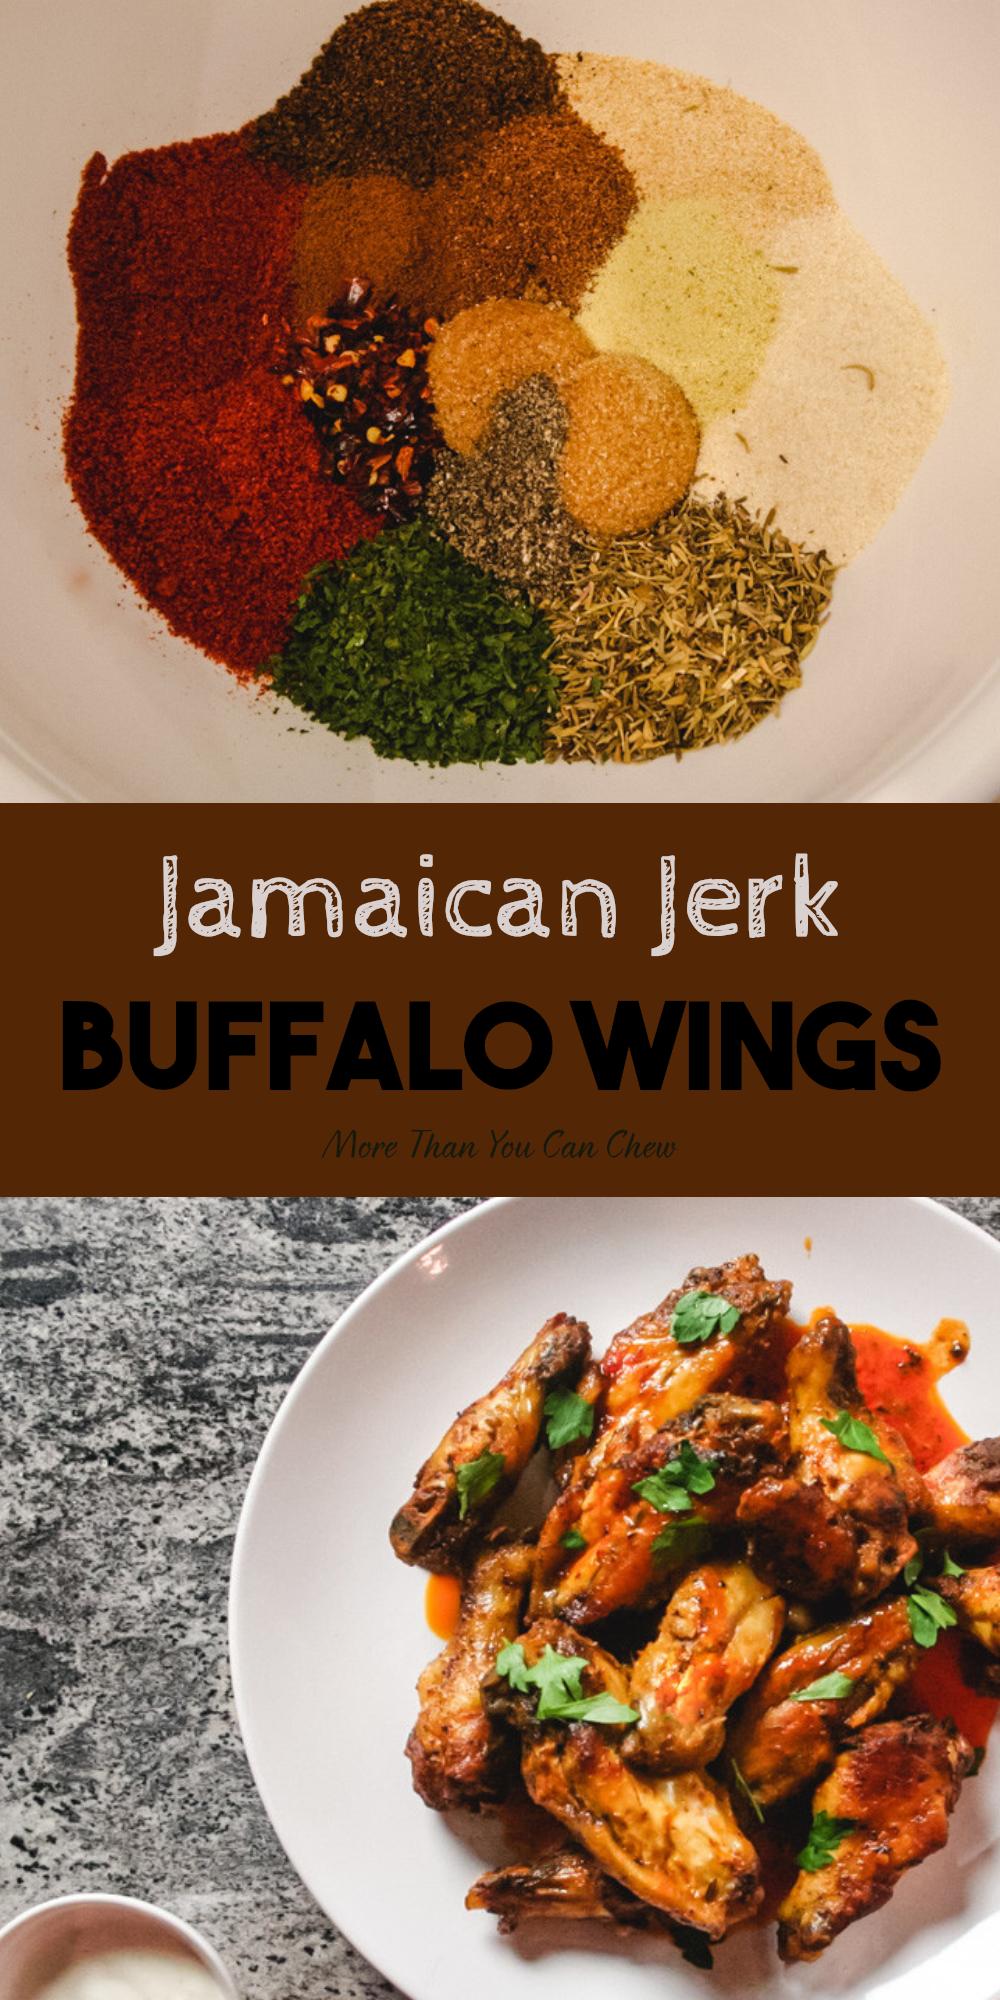 Jamaican Jerk Buffalo Wings